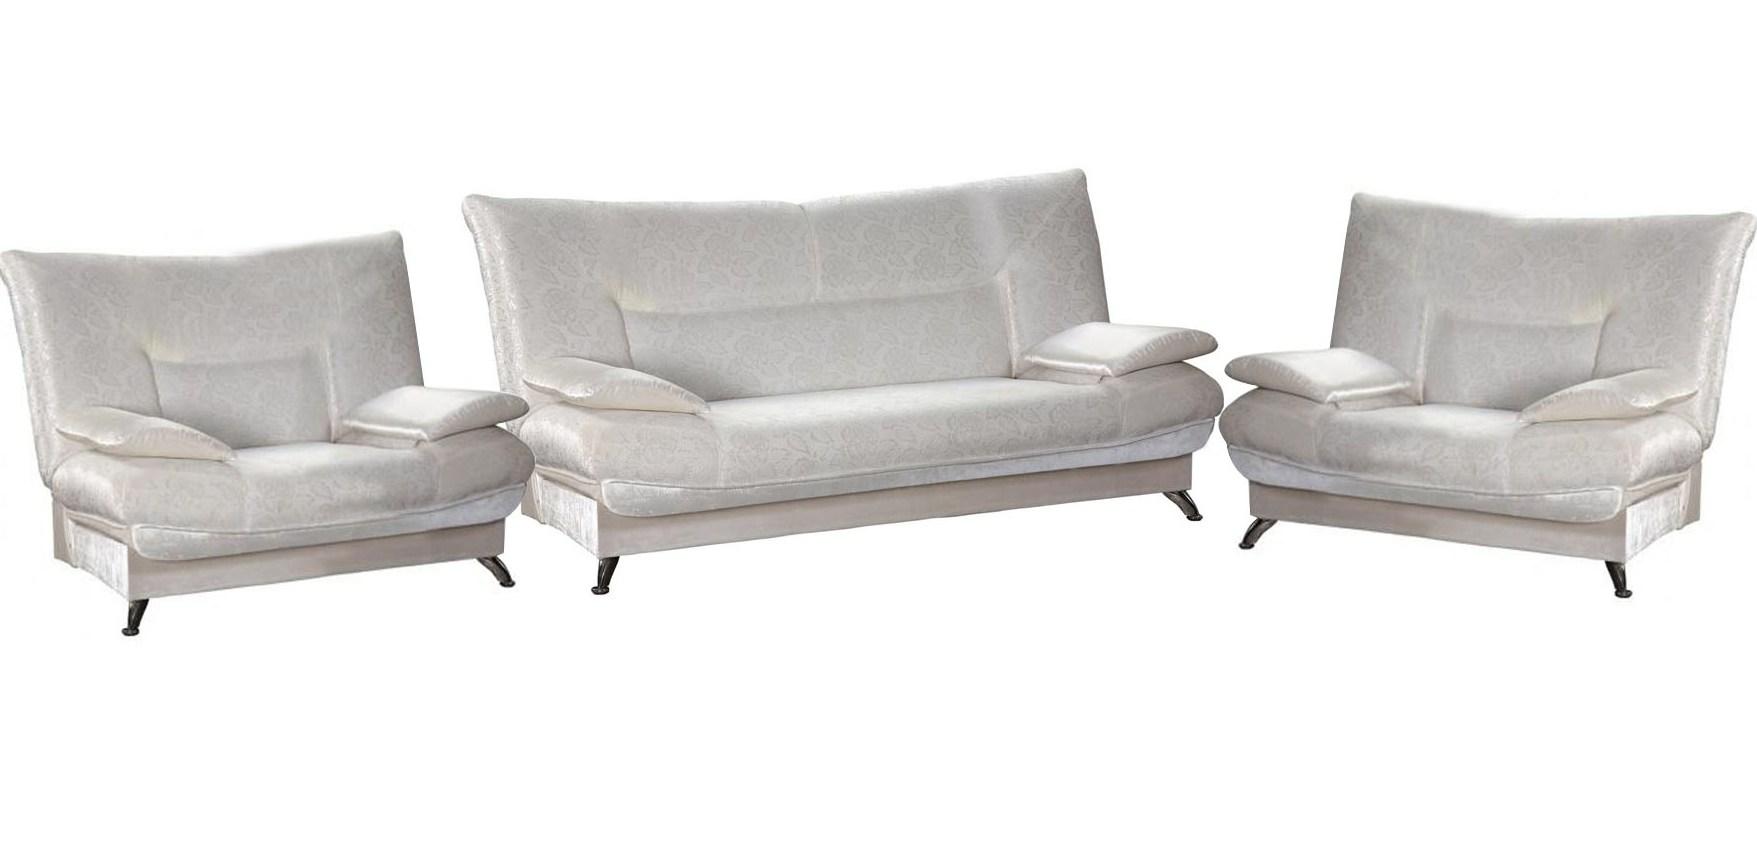 Комплект мягкой мебели Сатурн